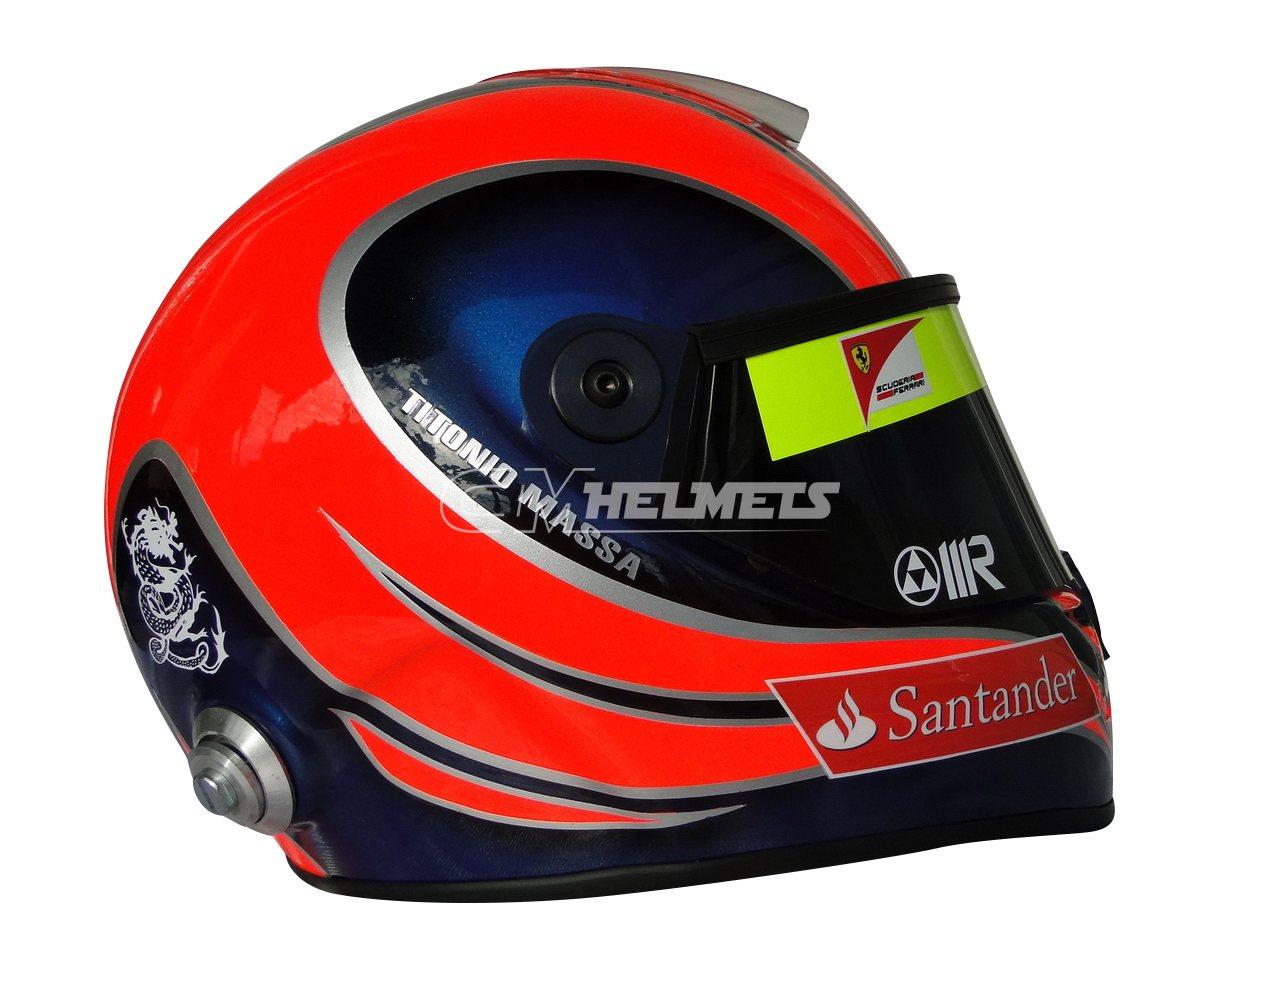 FELIPE MASSA 2012 INTERLAGOS GP F1 REPLICA HELMET FULL SIZE